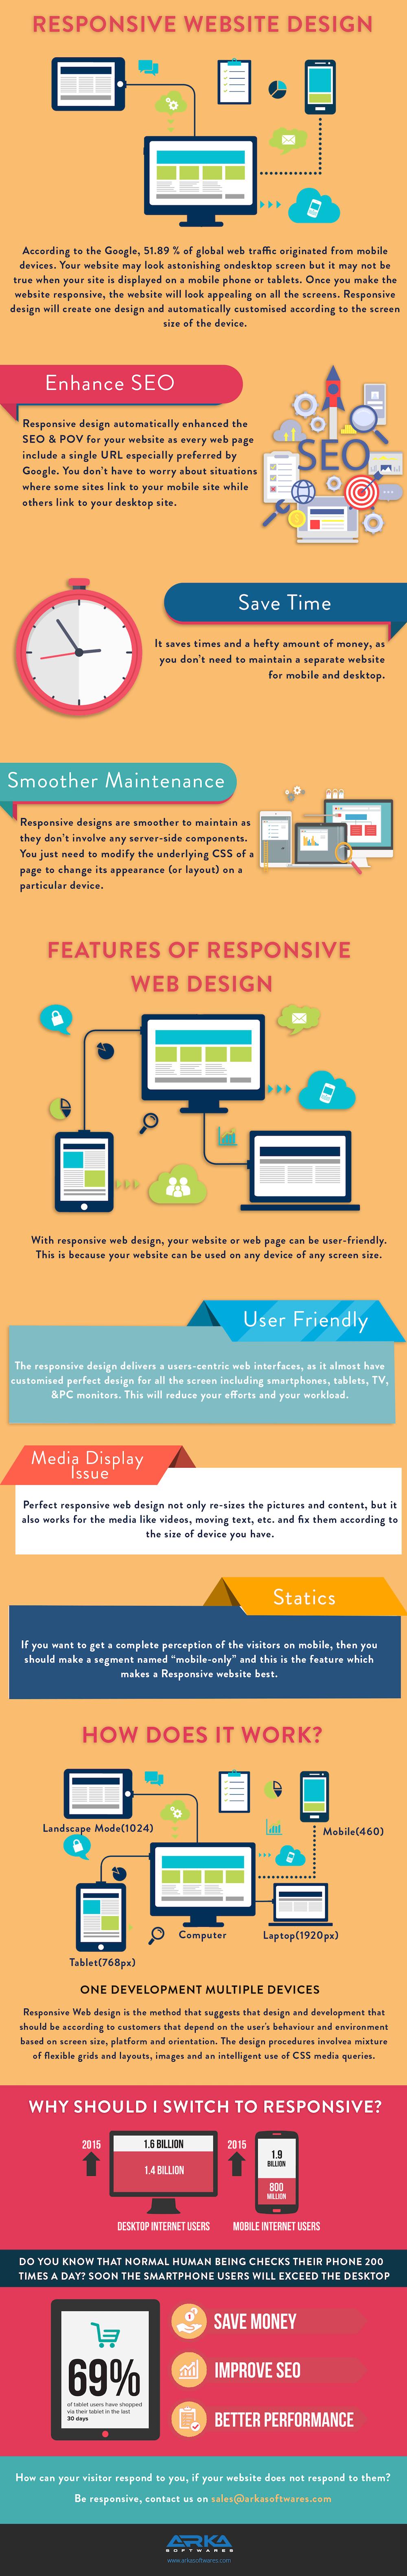 Responsive Web Design Infographic Premiumcoding